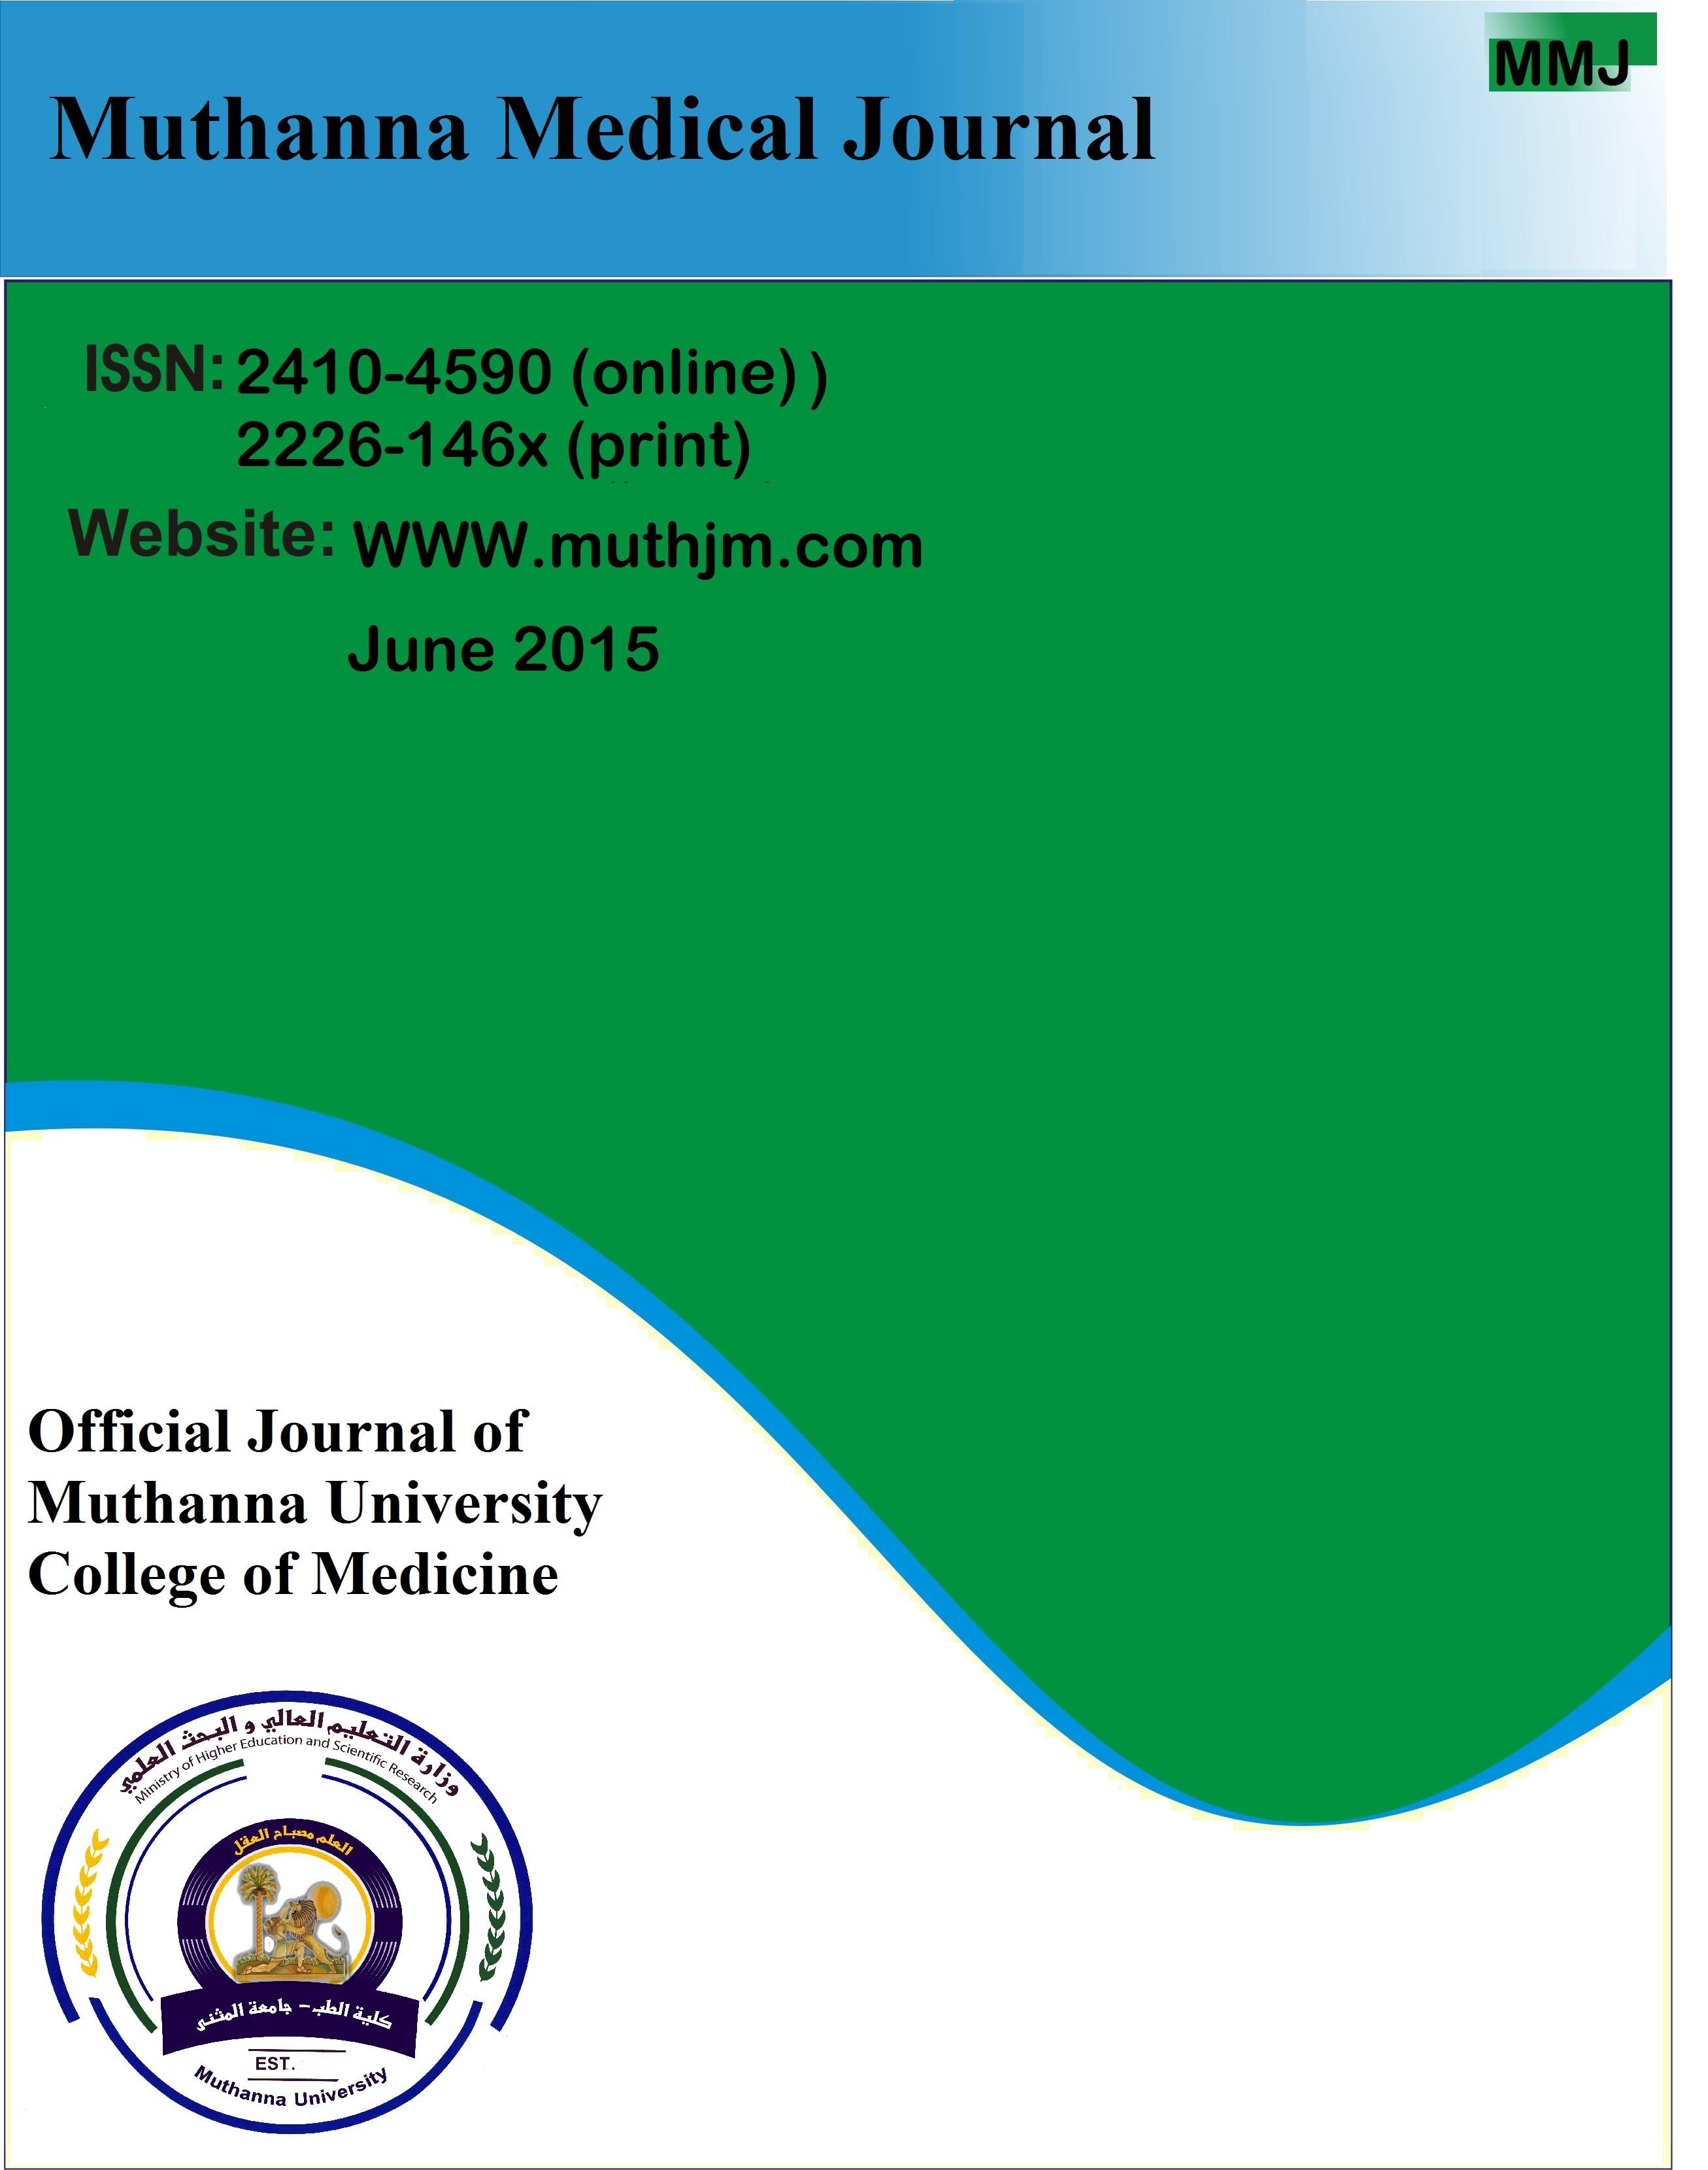 Muthanna Medical Journal (MMJ)